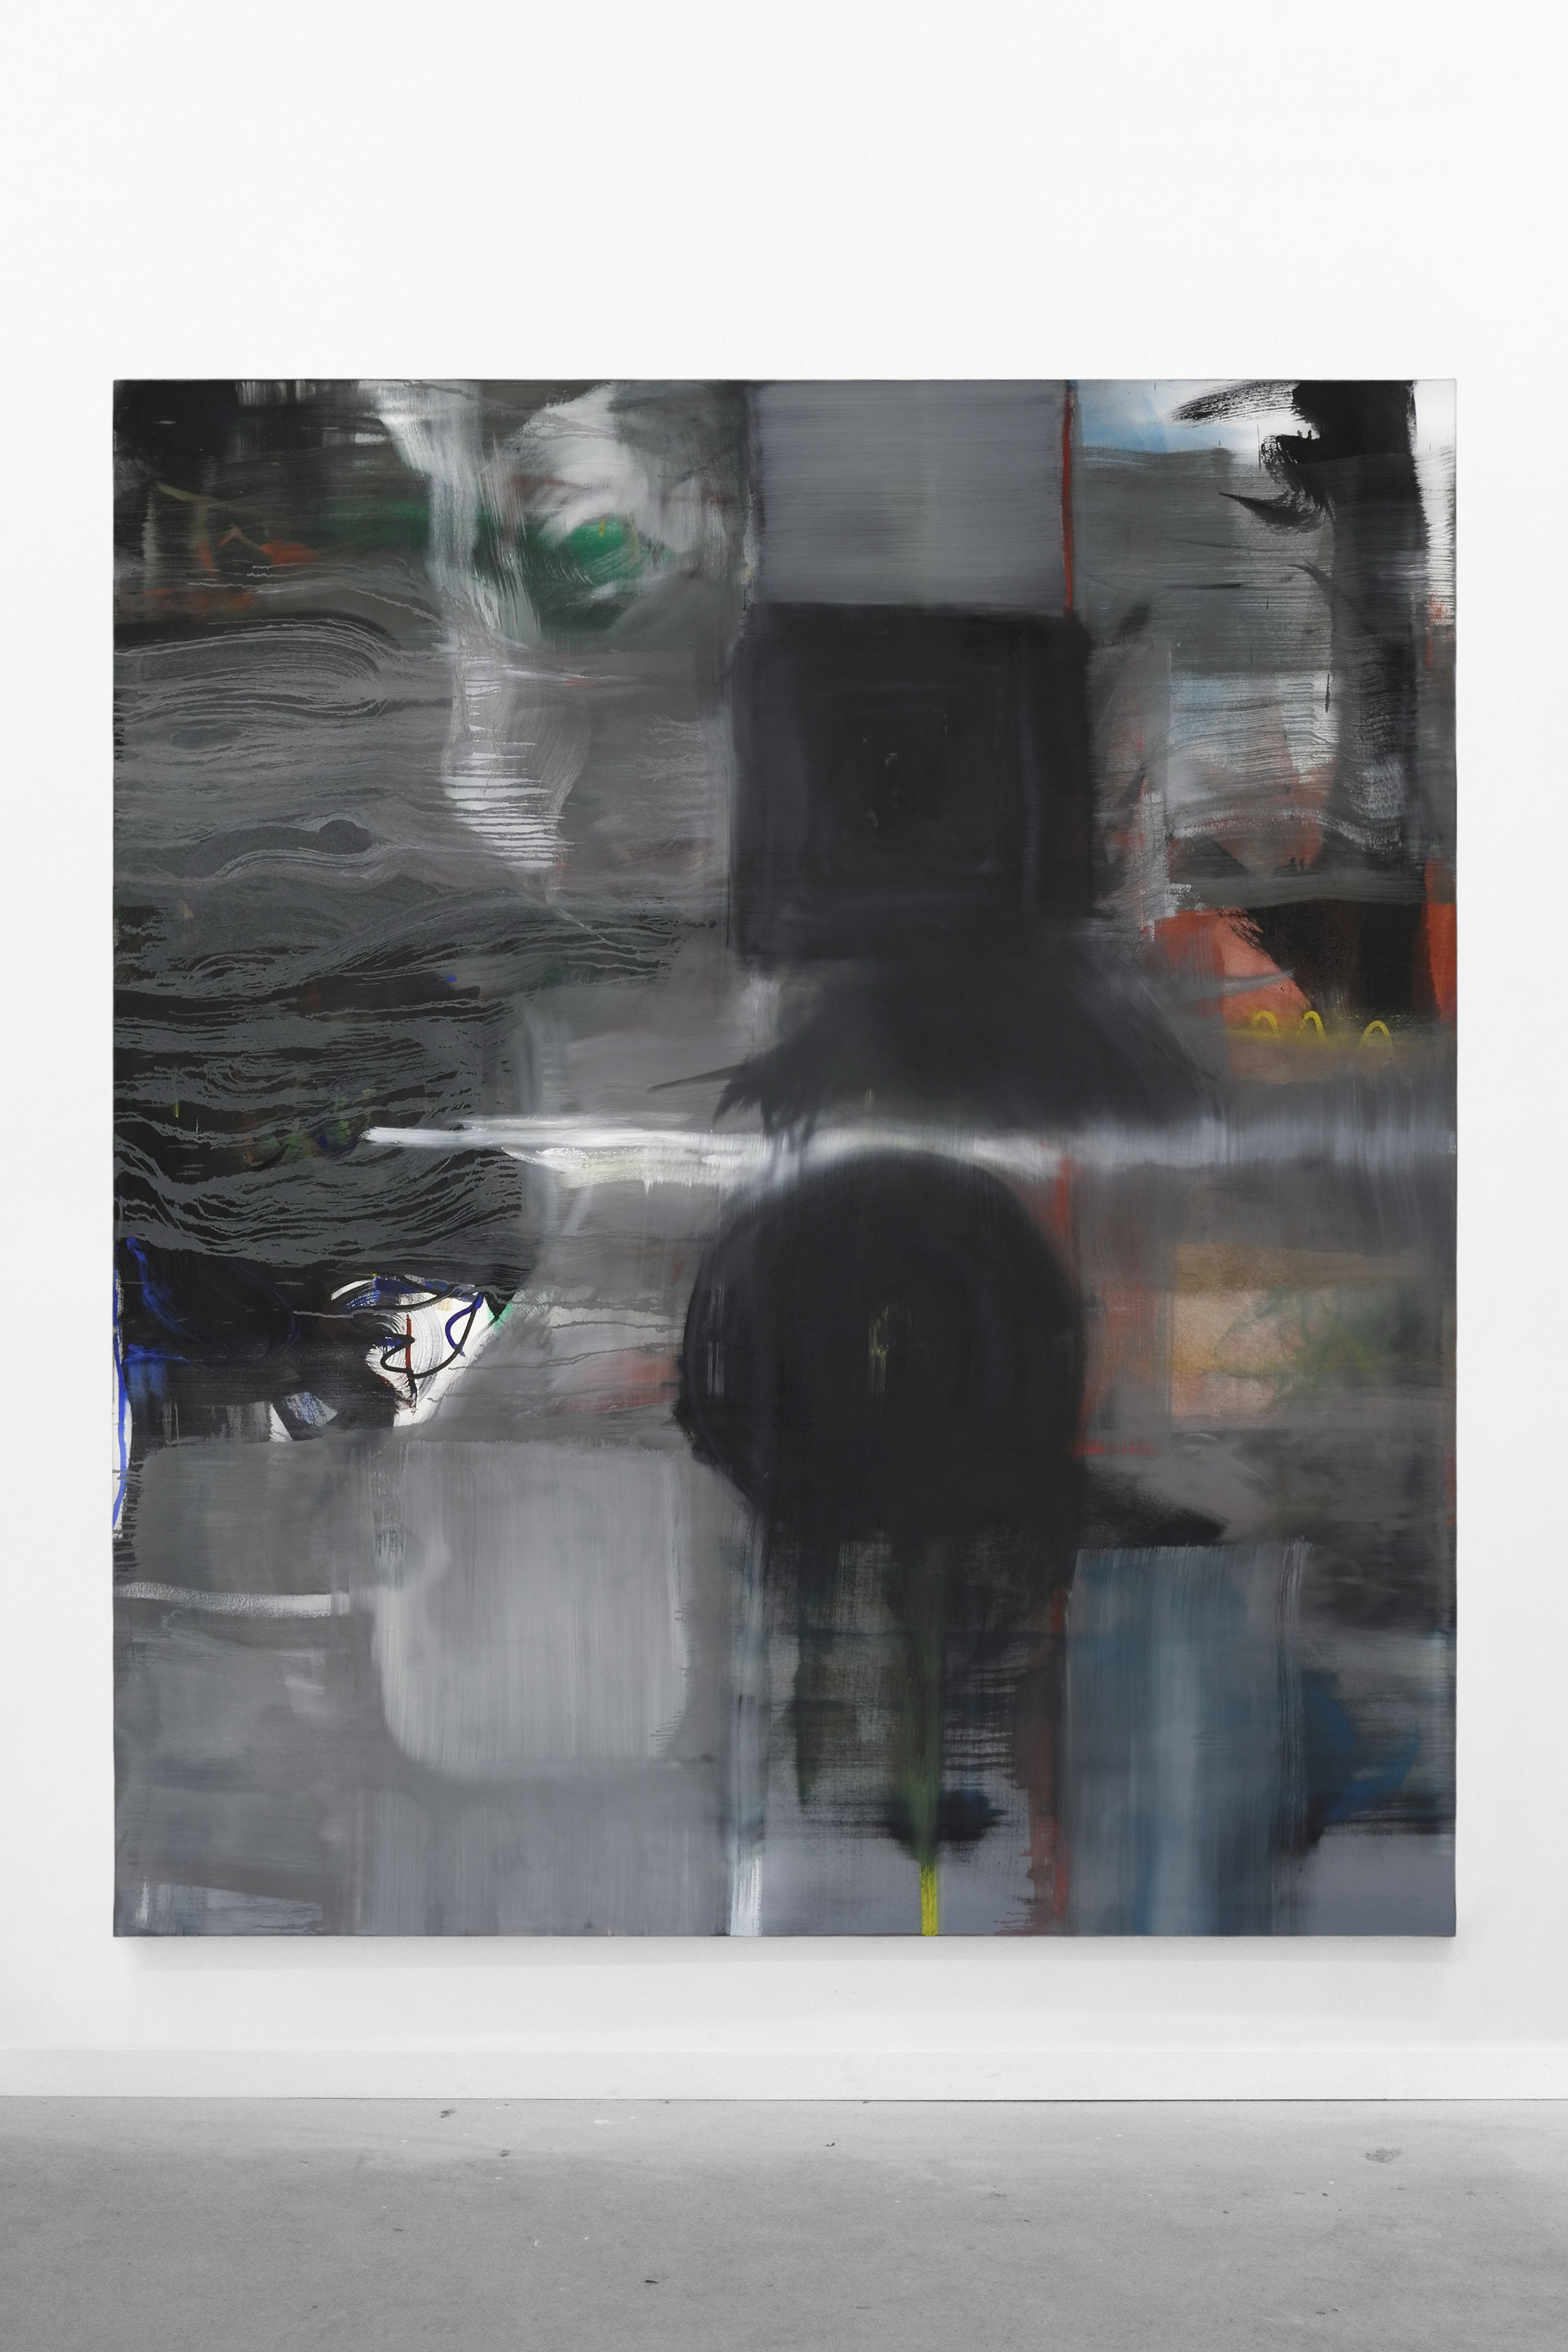 Sonya Derviz, Untitled, oil on canvas, 220x190 cm, 2018